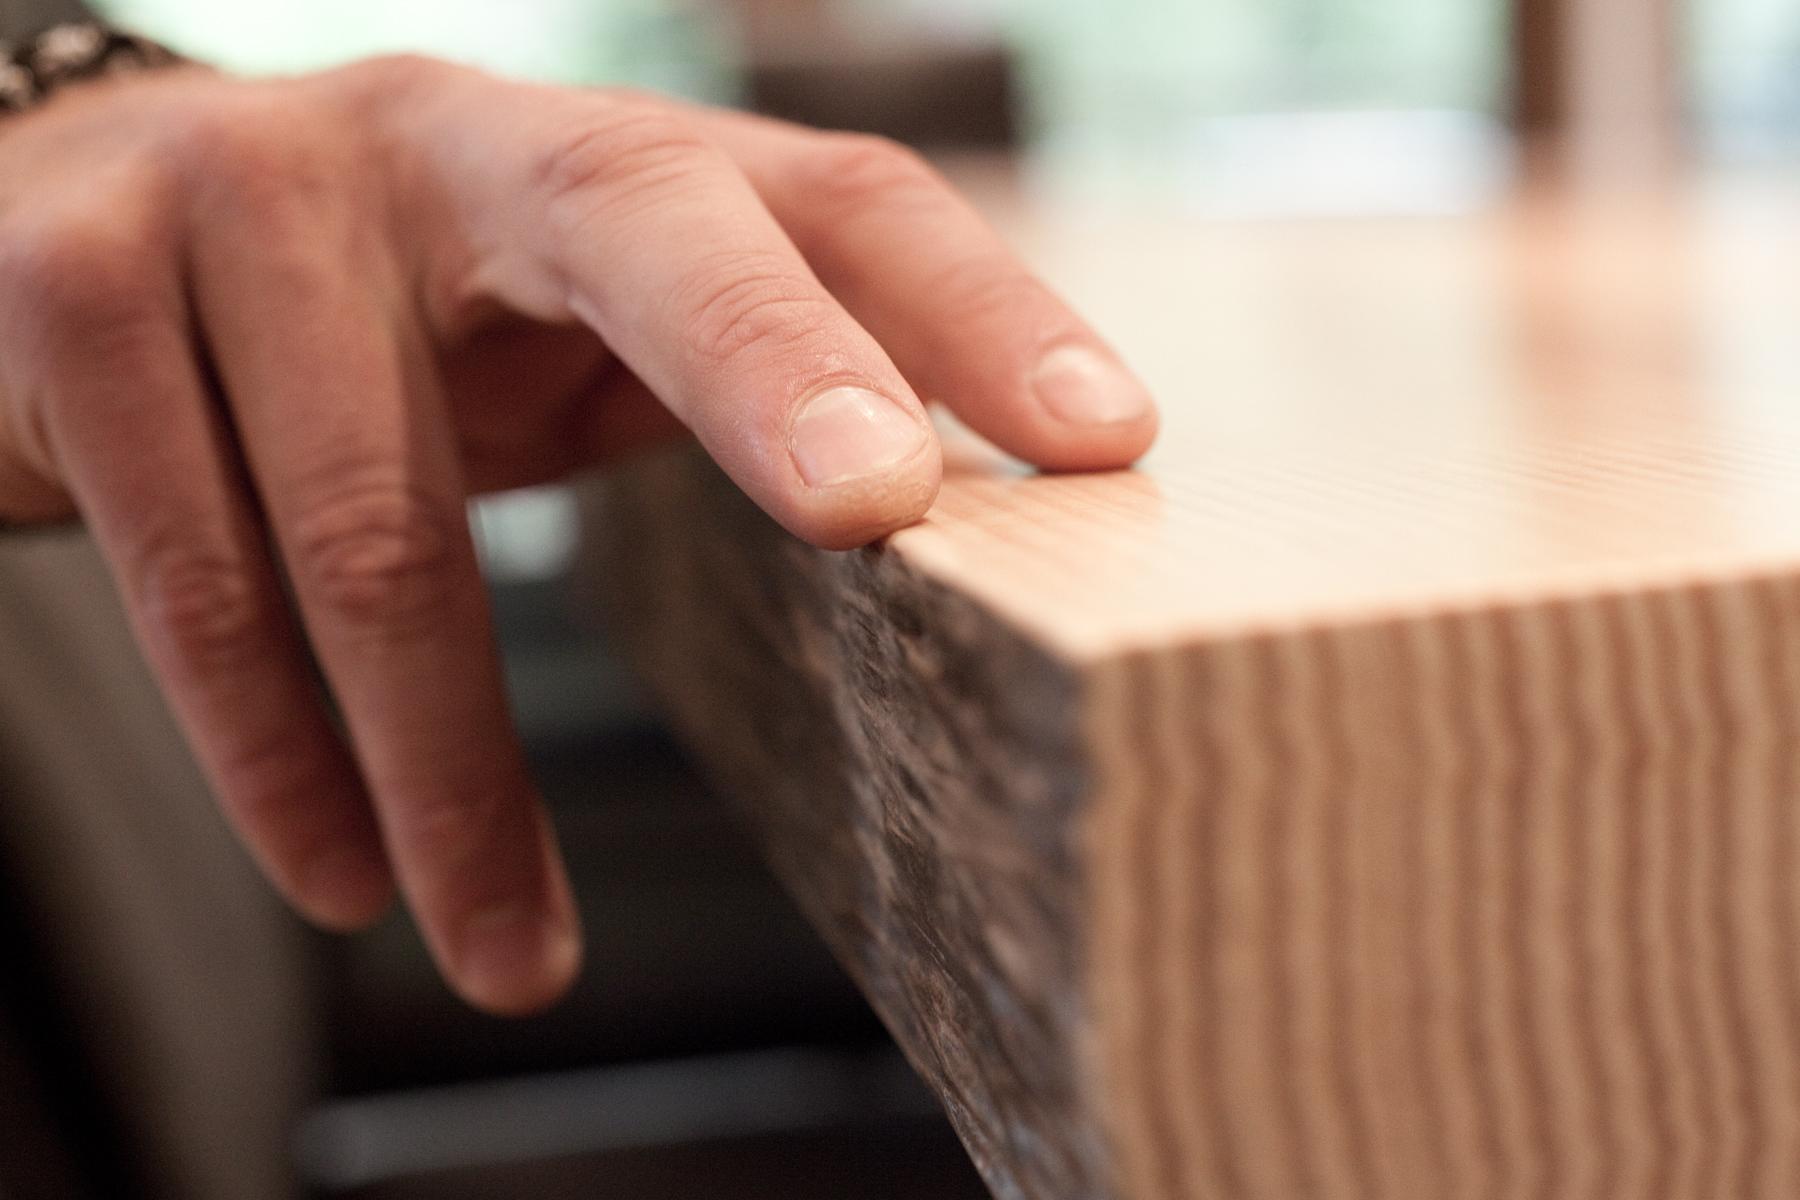 craftmens touch.jpg